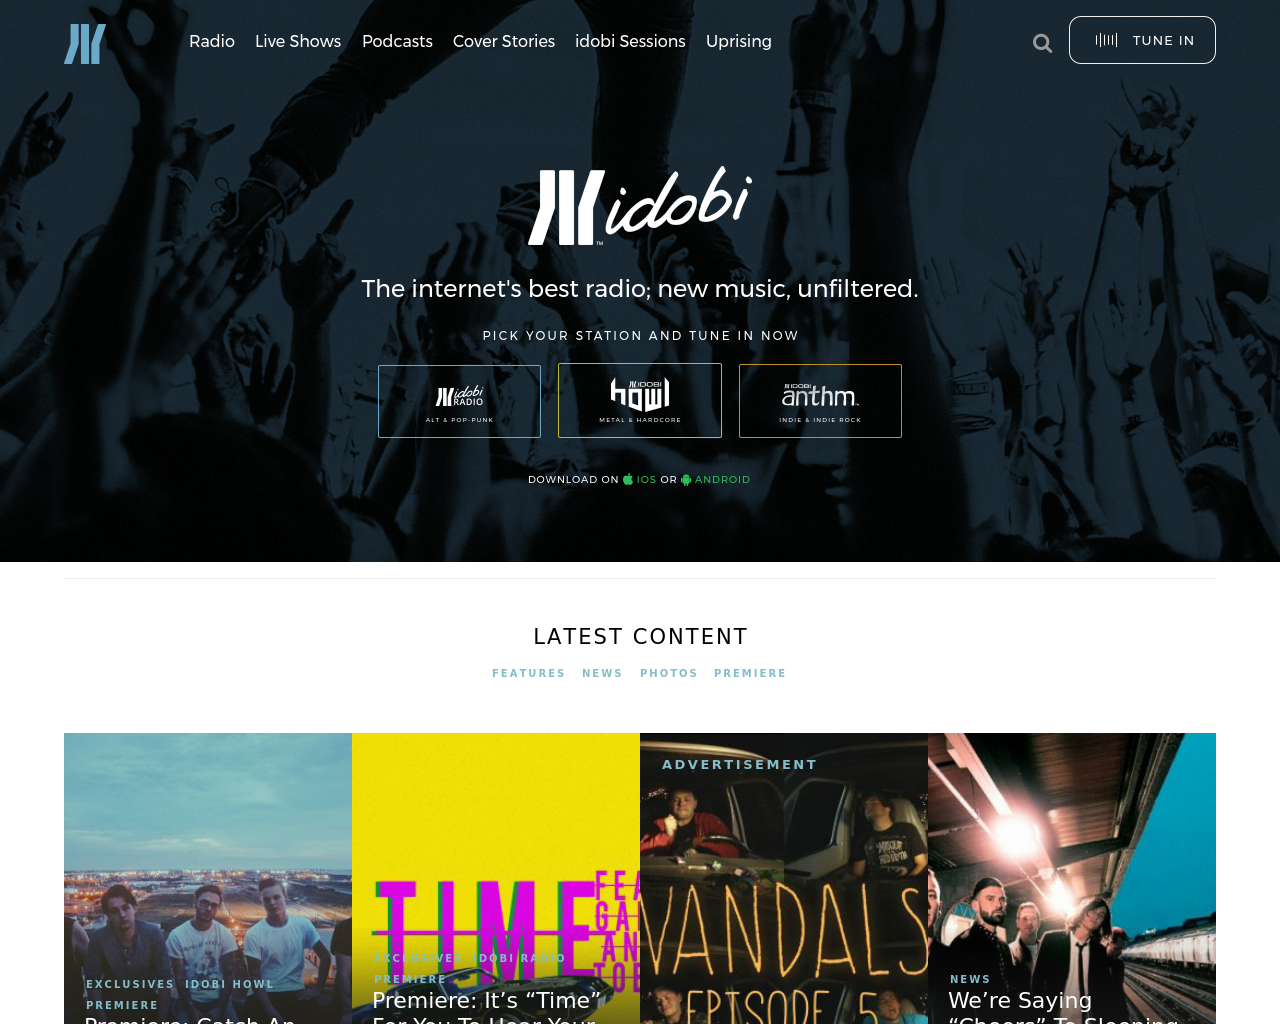 Idobi.com-Advertising-Reviews-Pricing